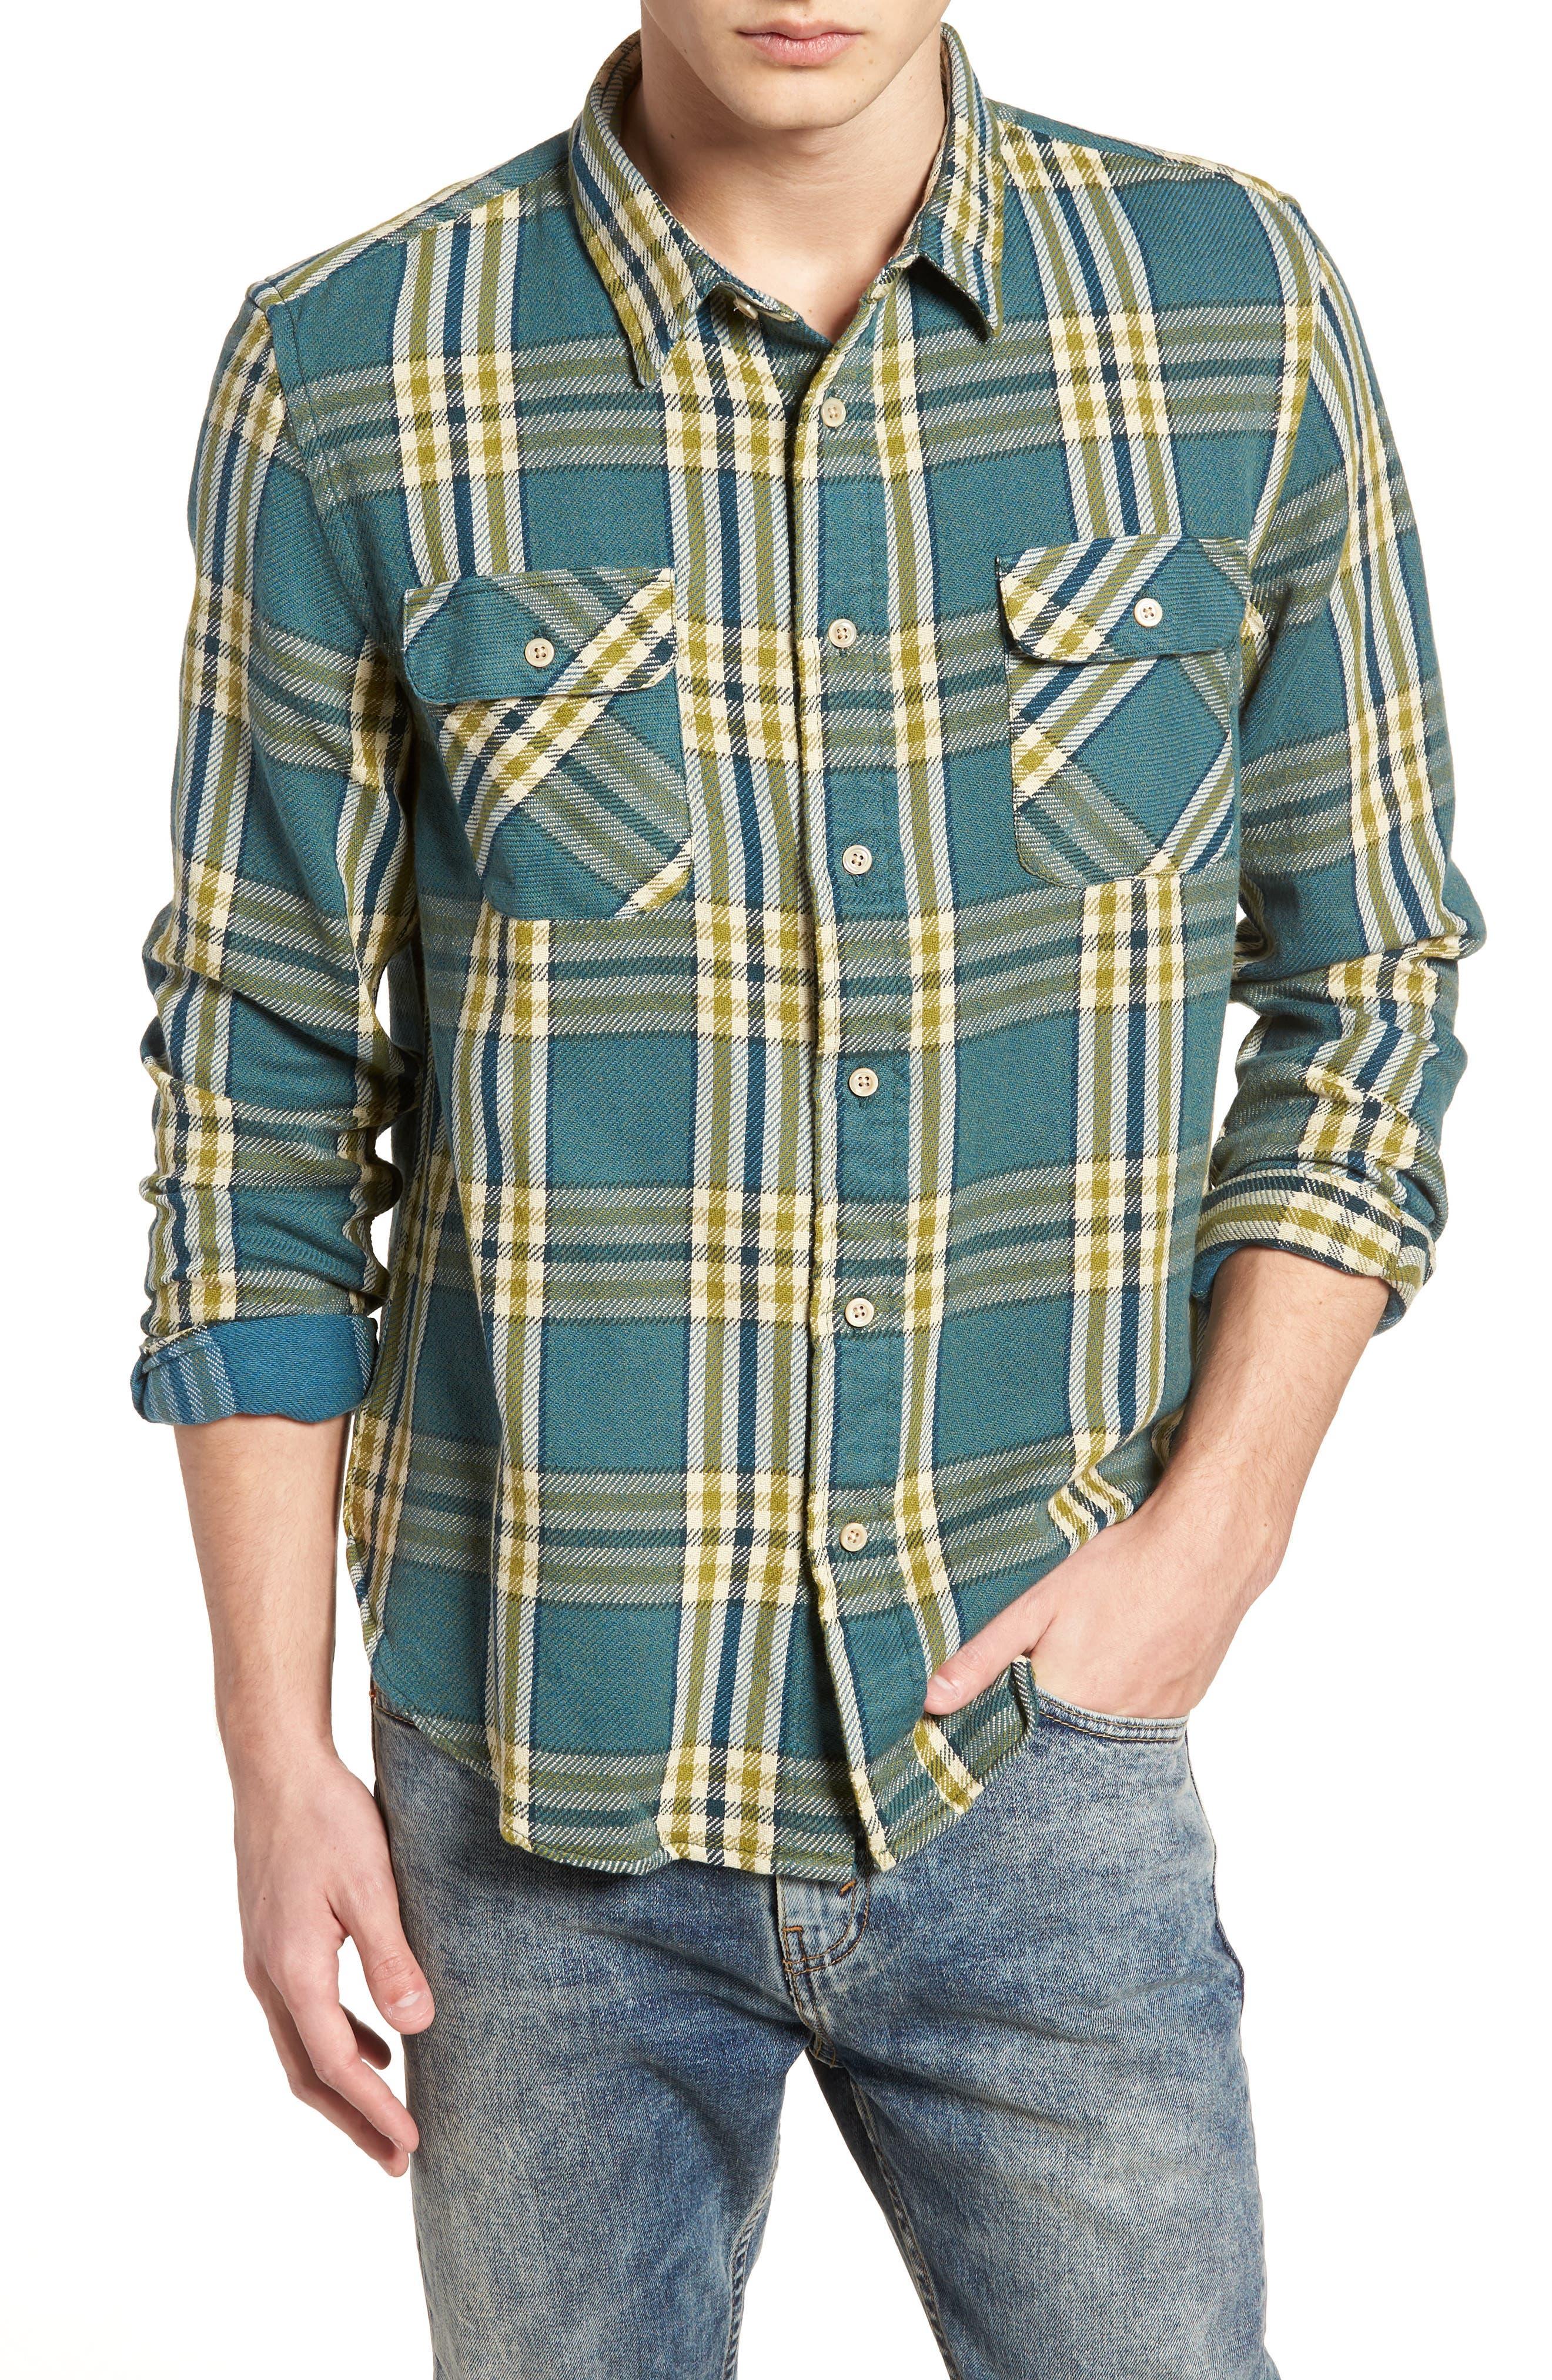 Shorthorn Western Shirt,                             Main thumbnail 1, color,                             400